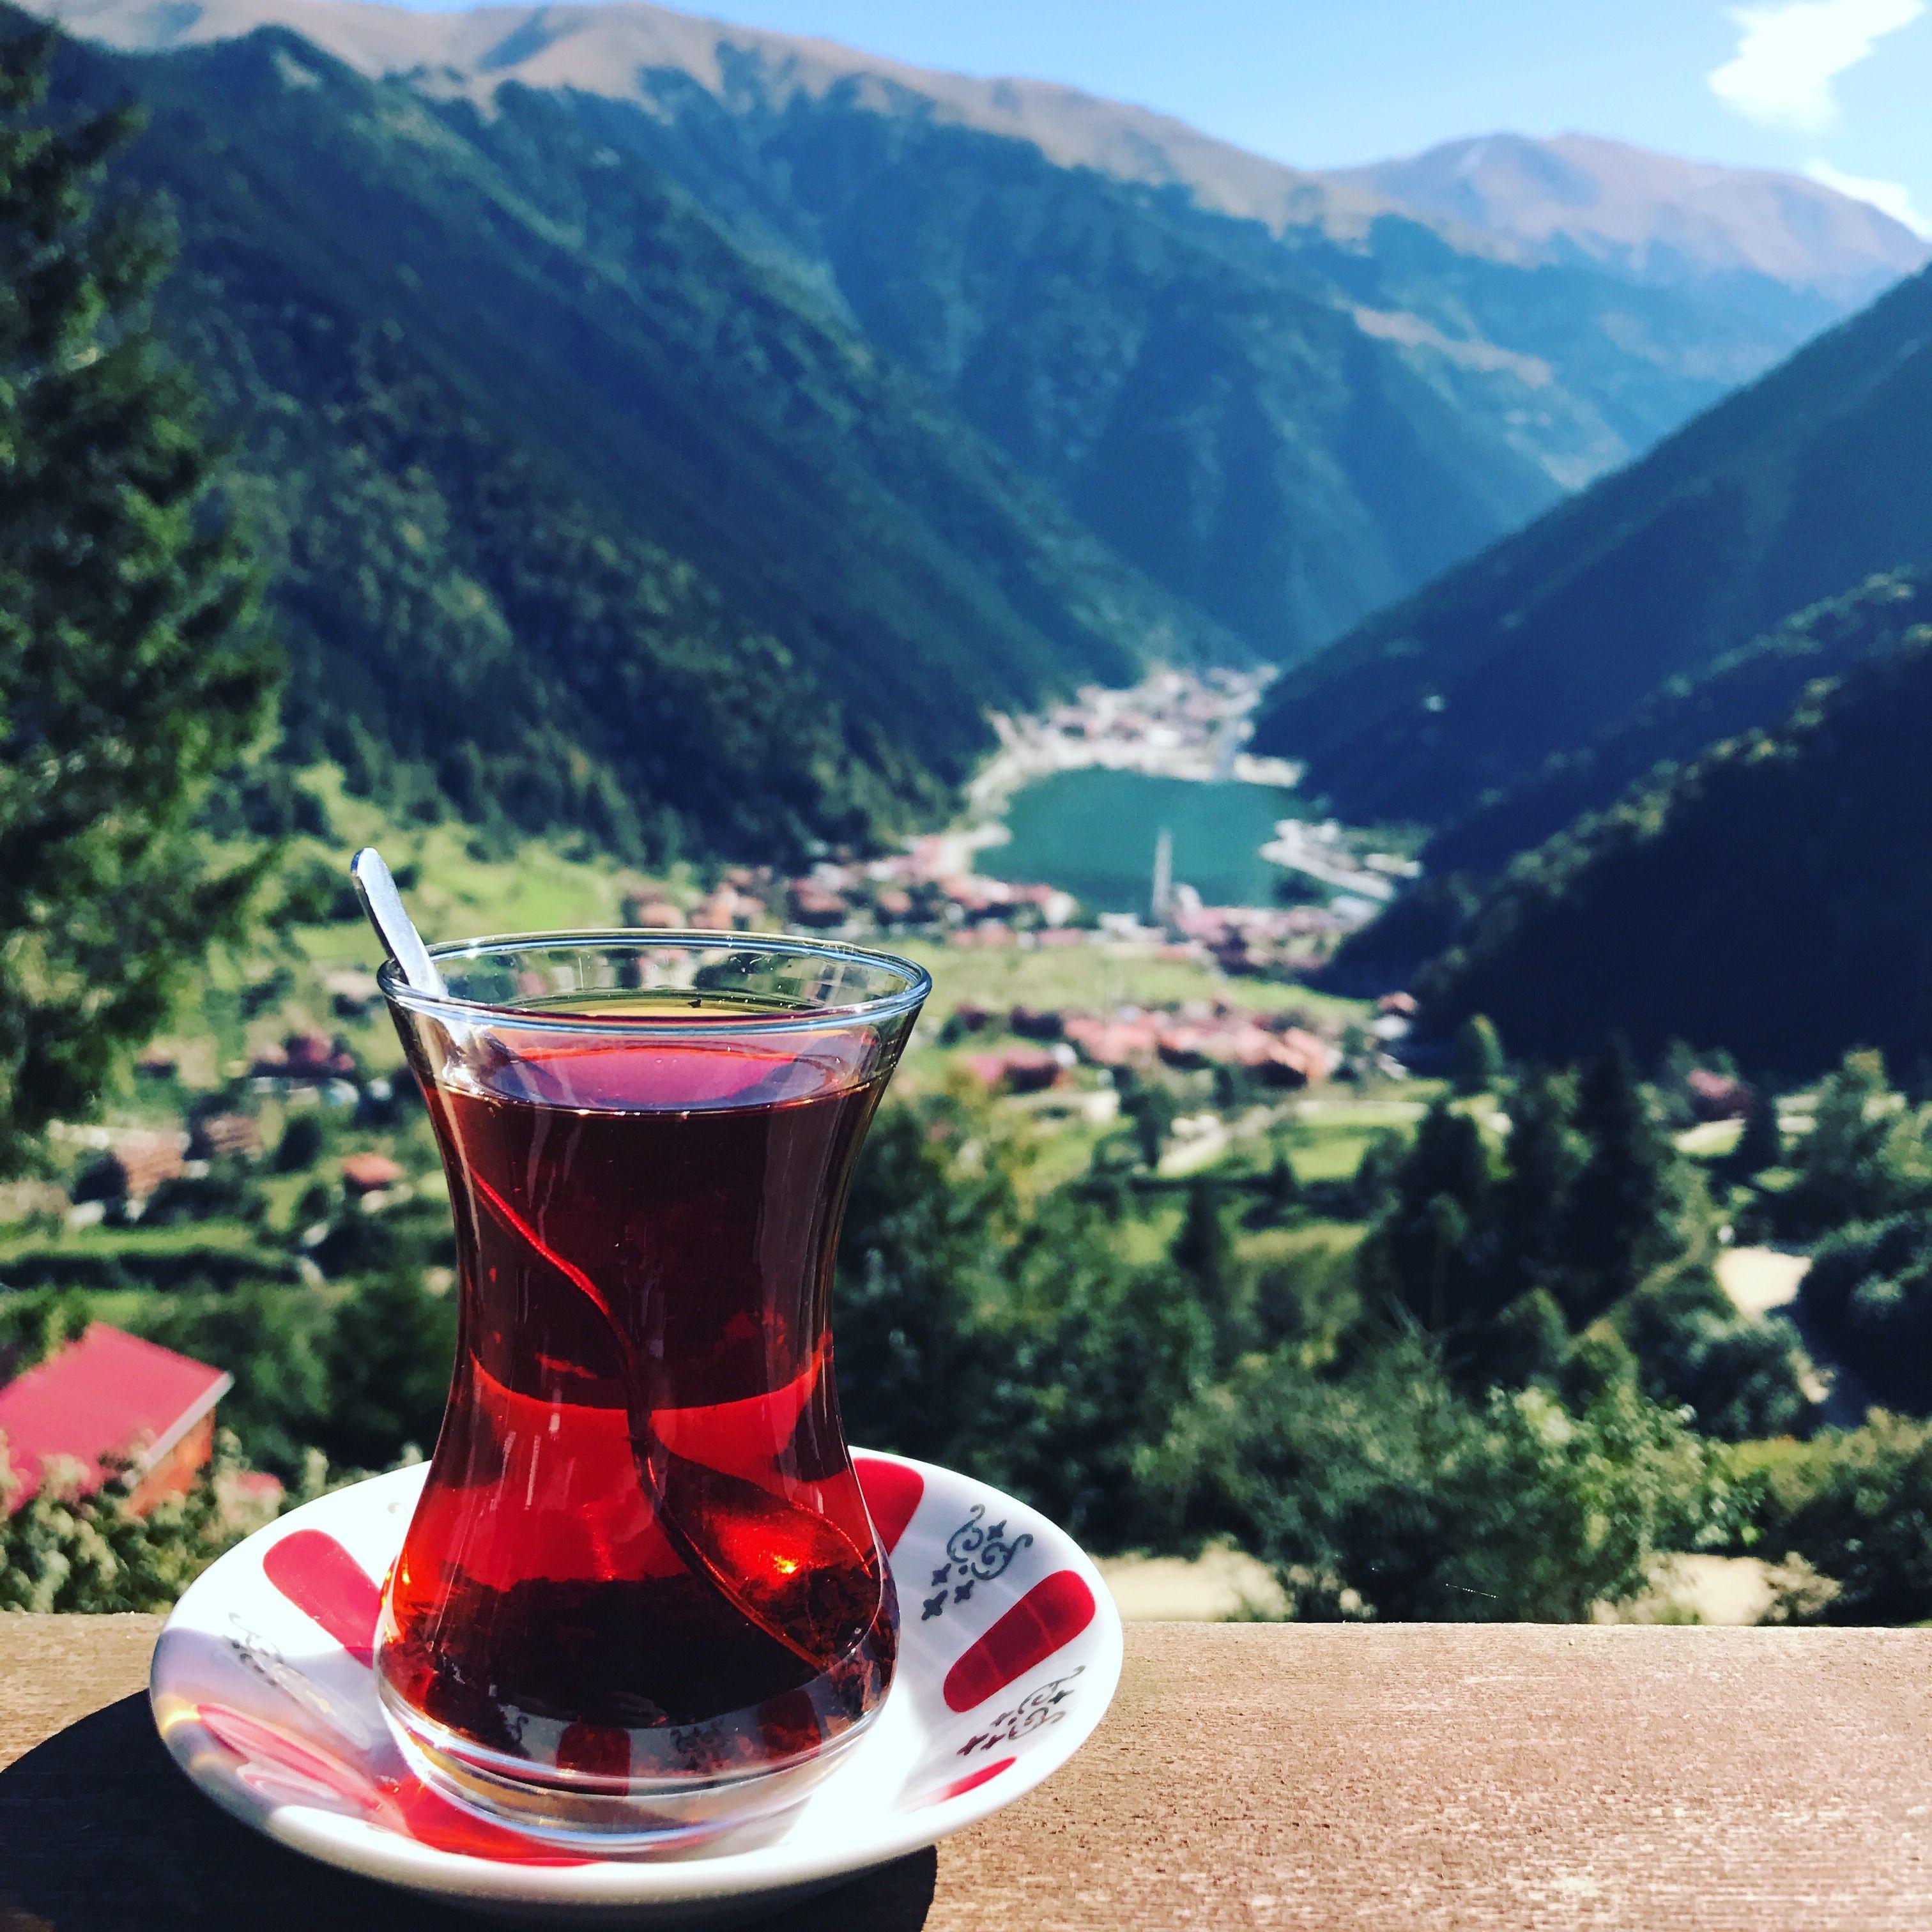 Turkey Trabzon Ouzengol تركيا طربزون اوزنغول Plane Photography Dream Vacations Photo Quotes